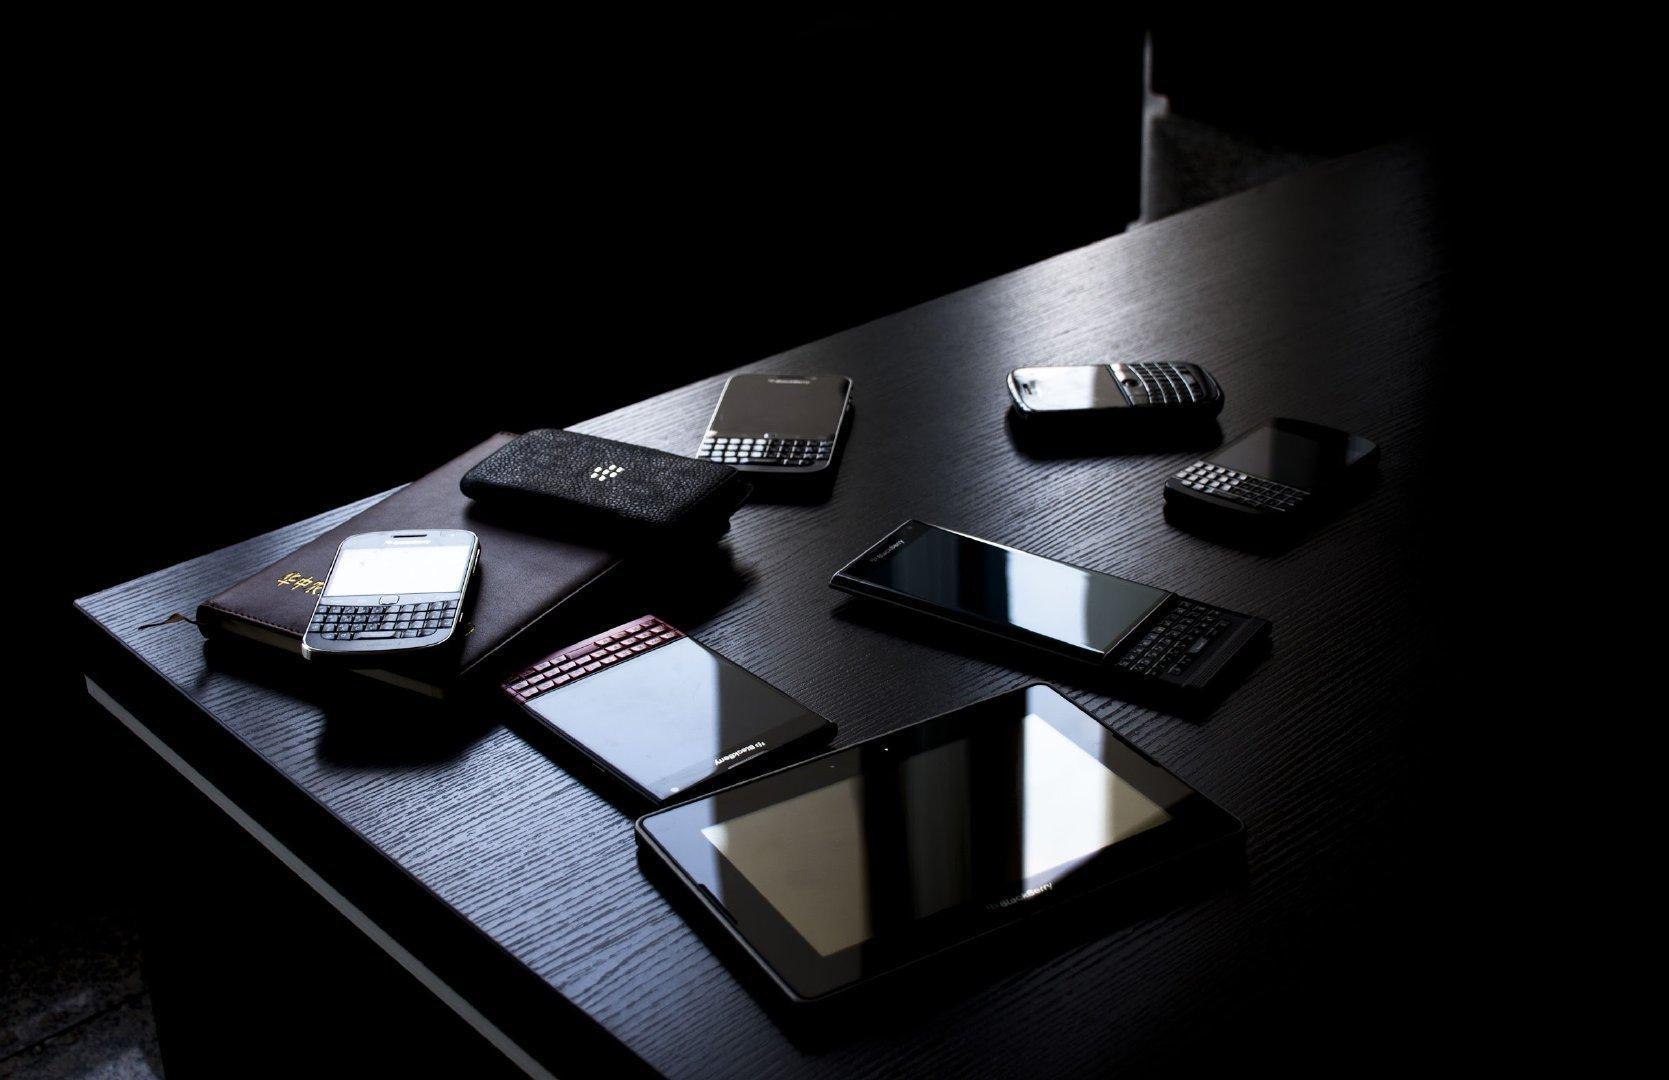 ◎ BlackBerry